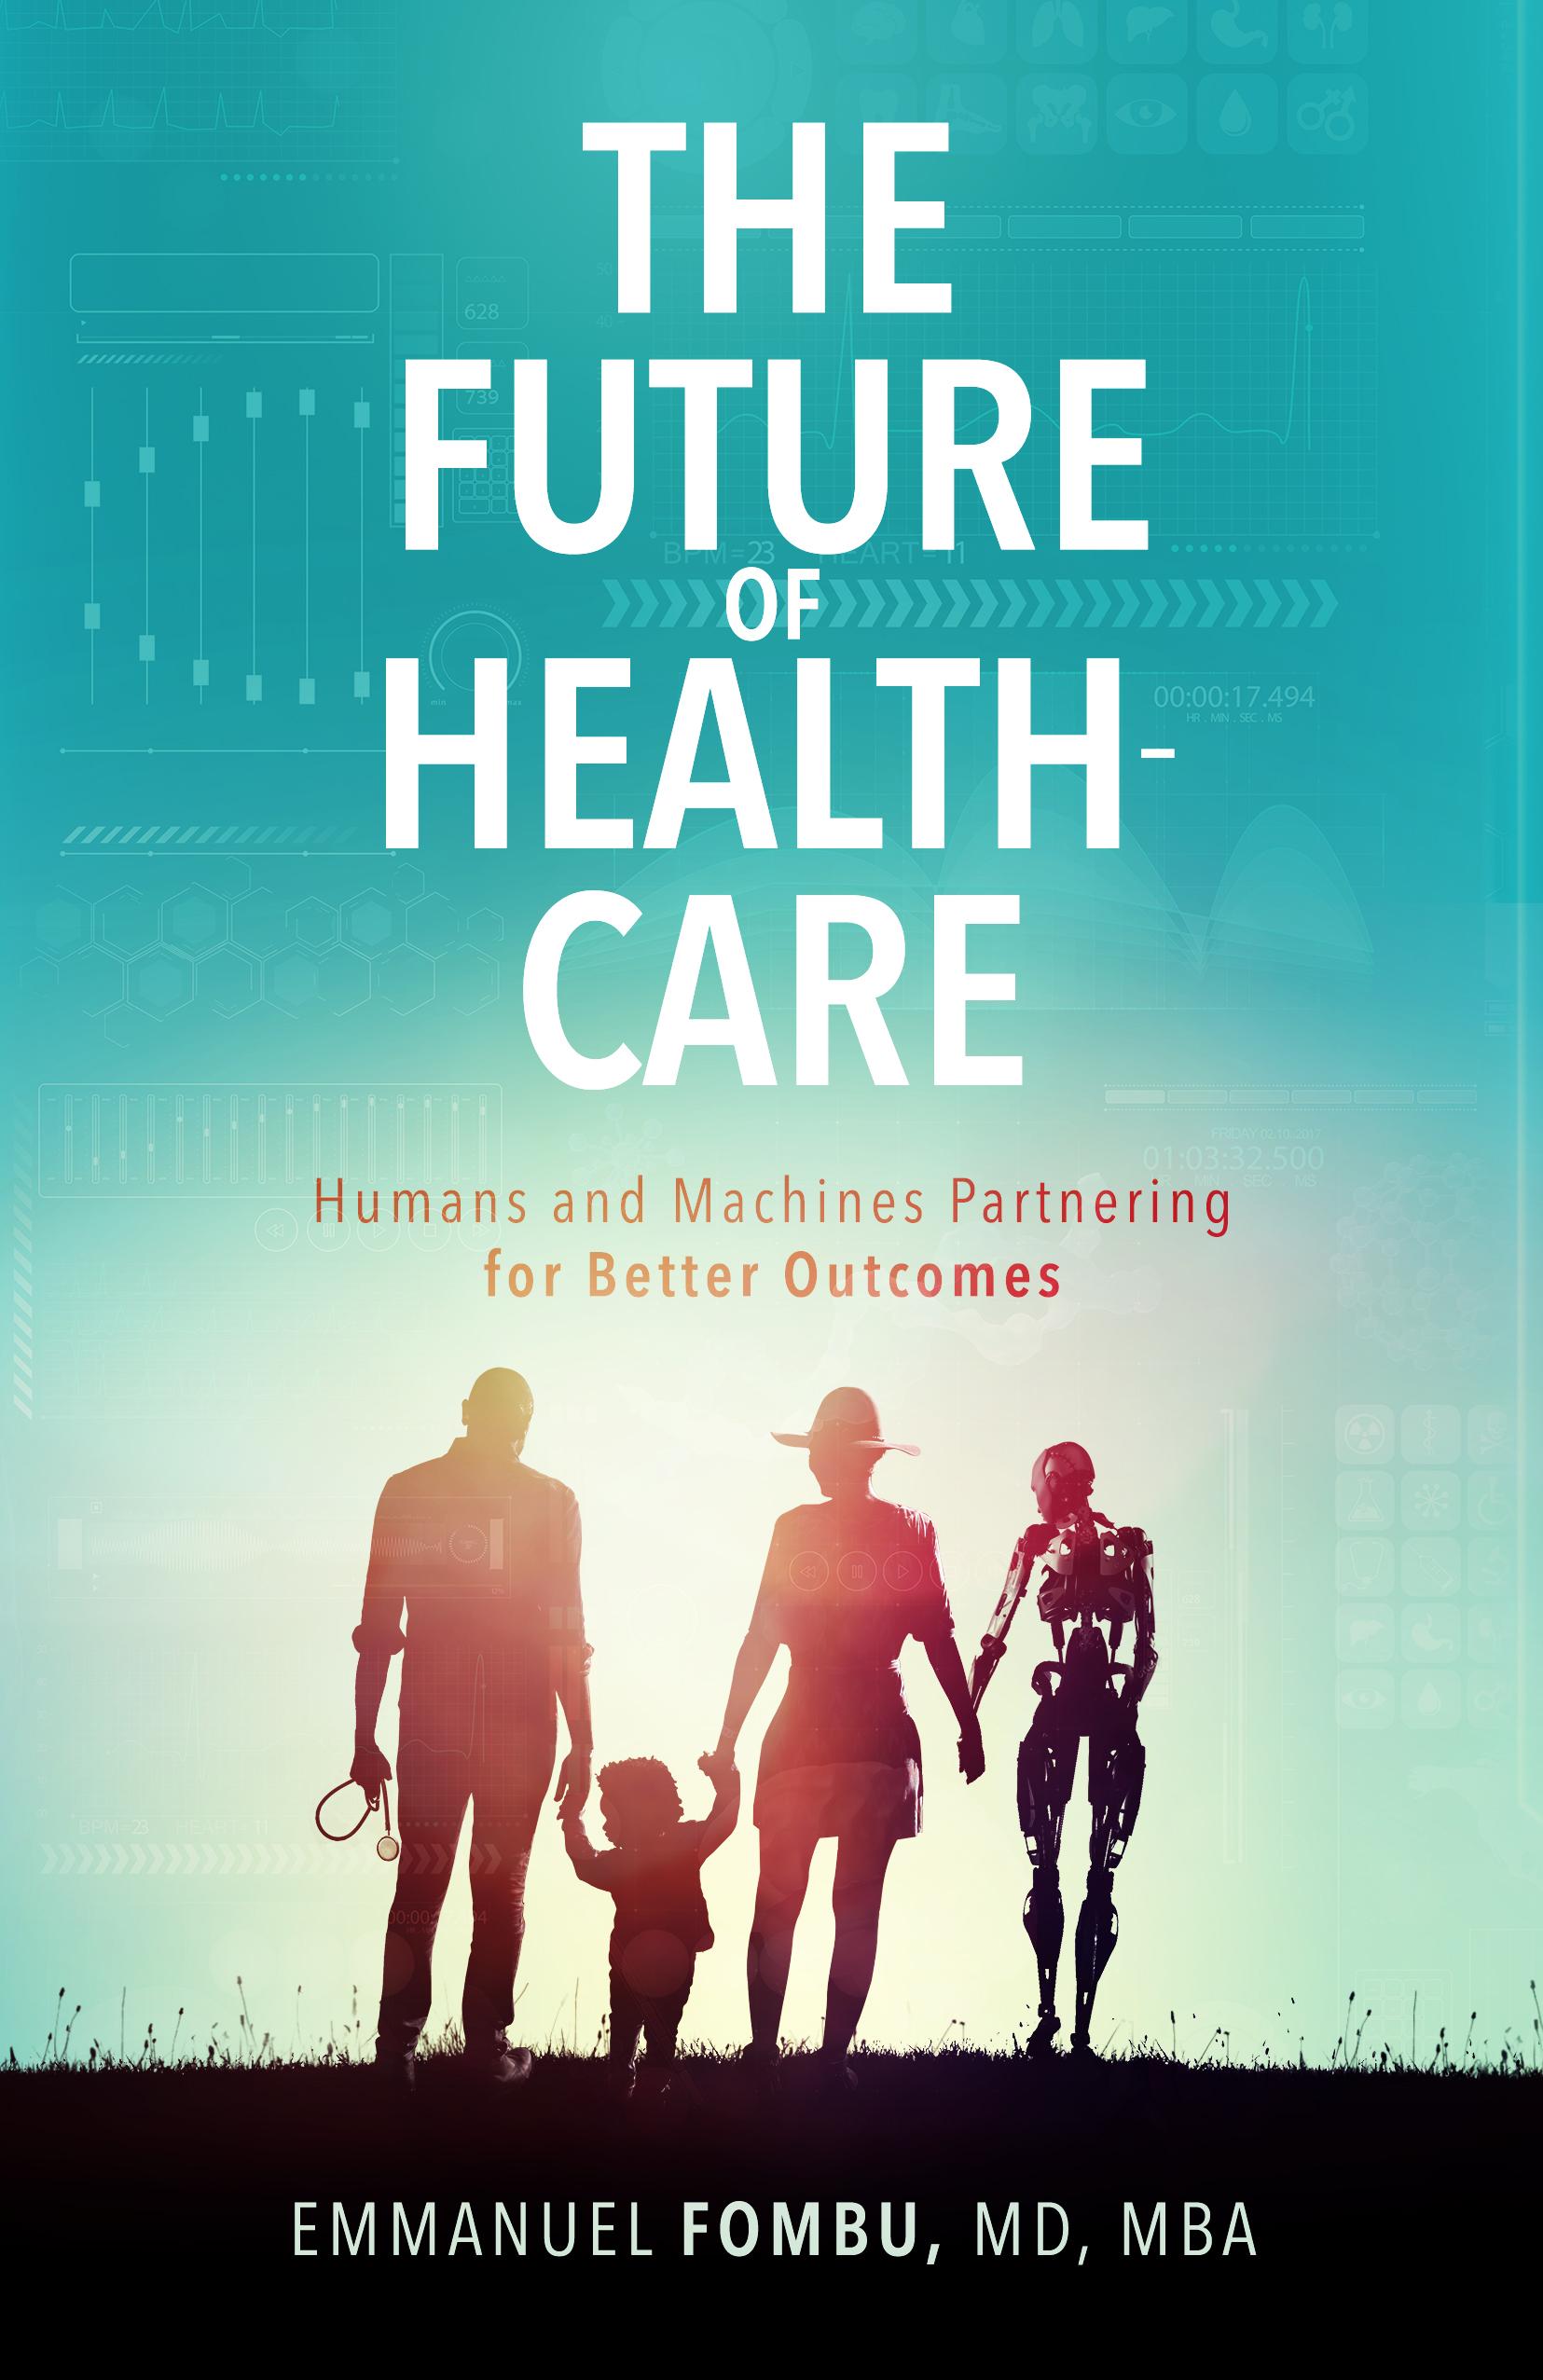 Emmanuel Fombu - The Future of Healthcare.jpg